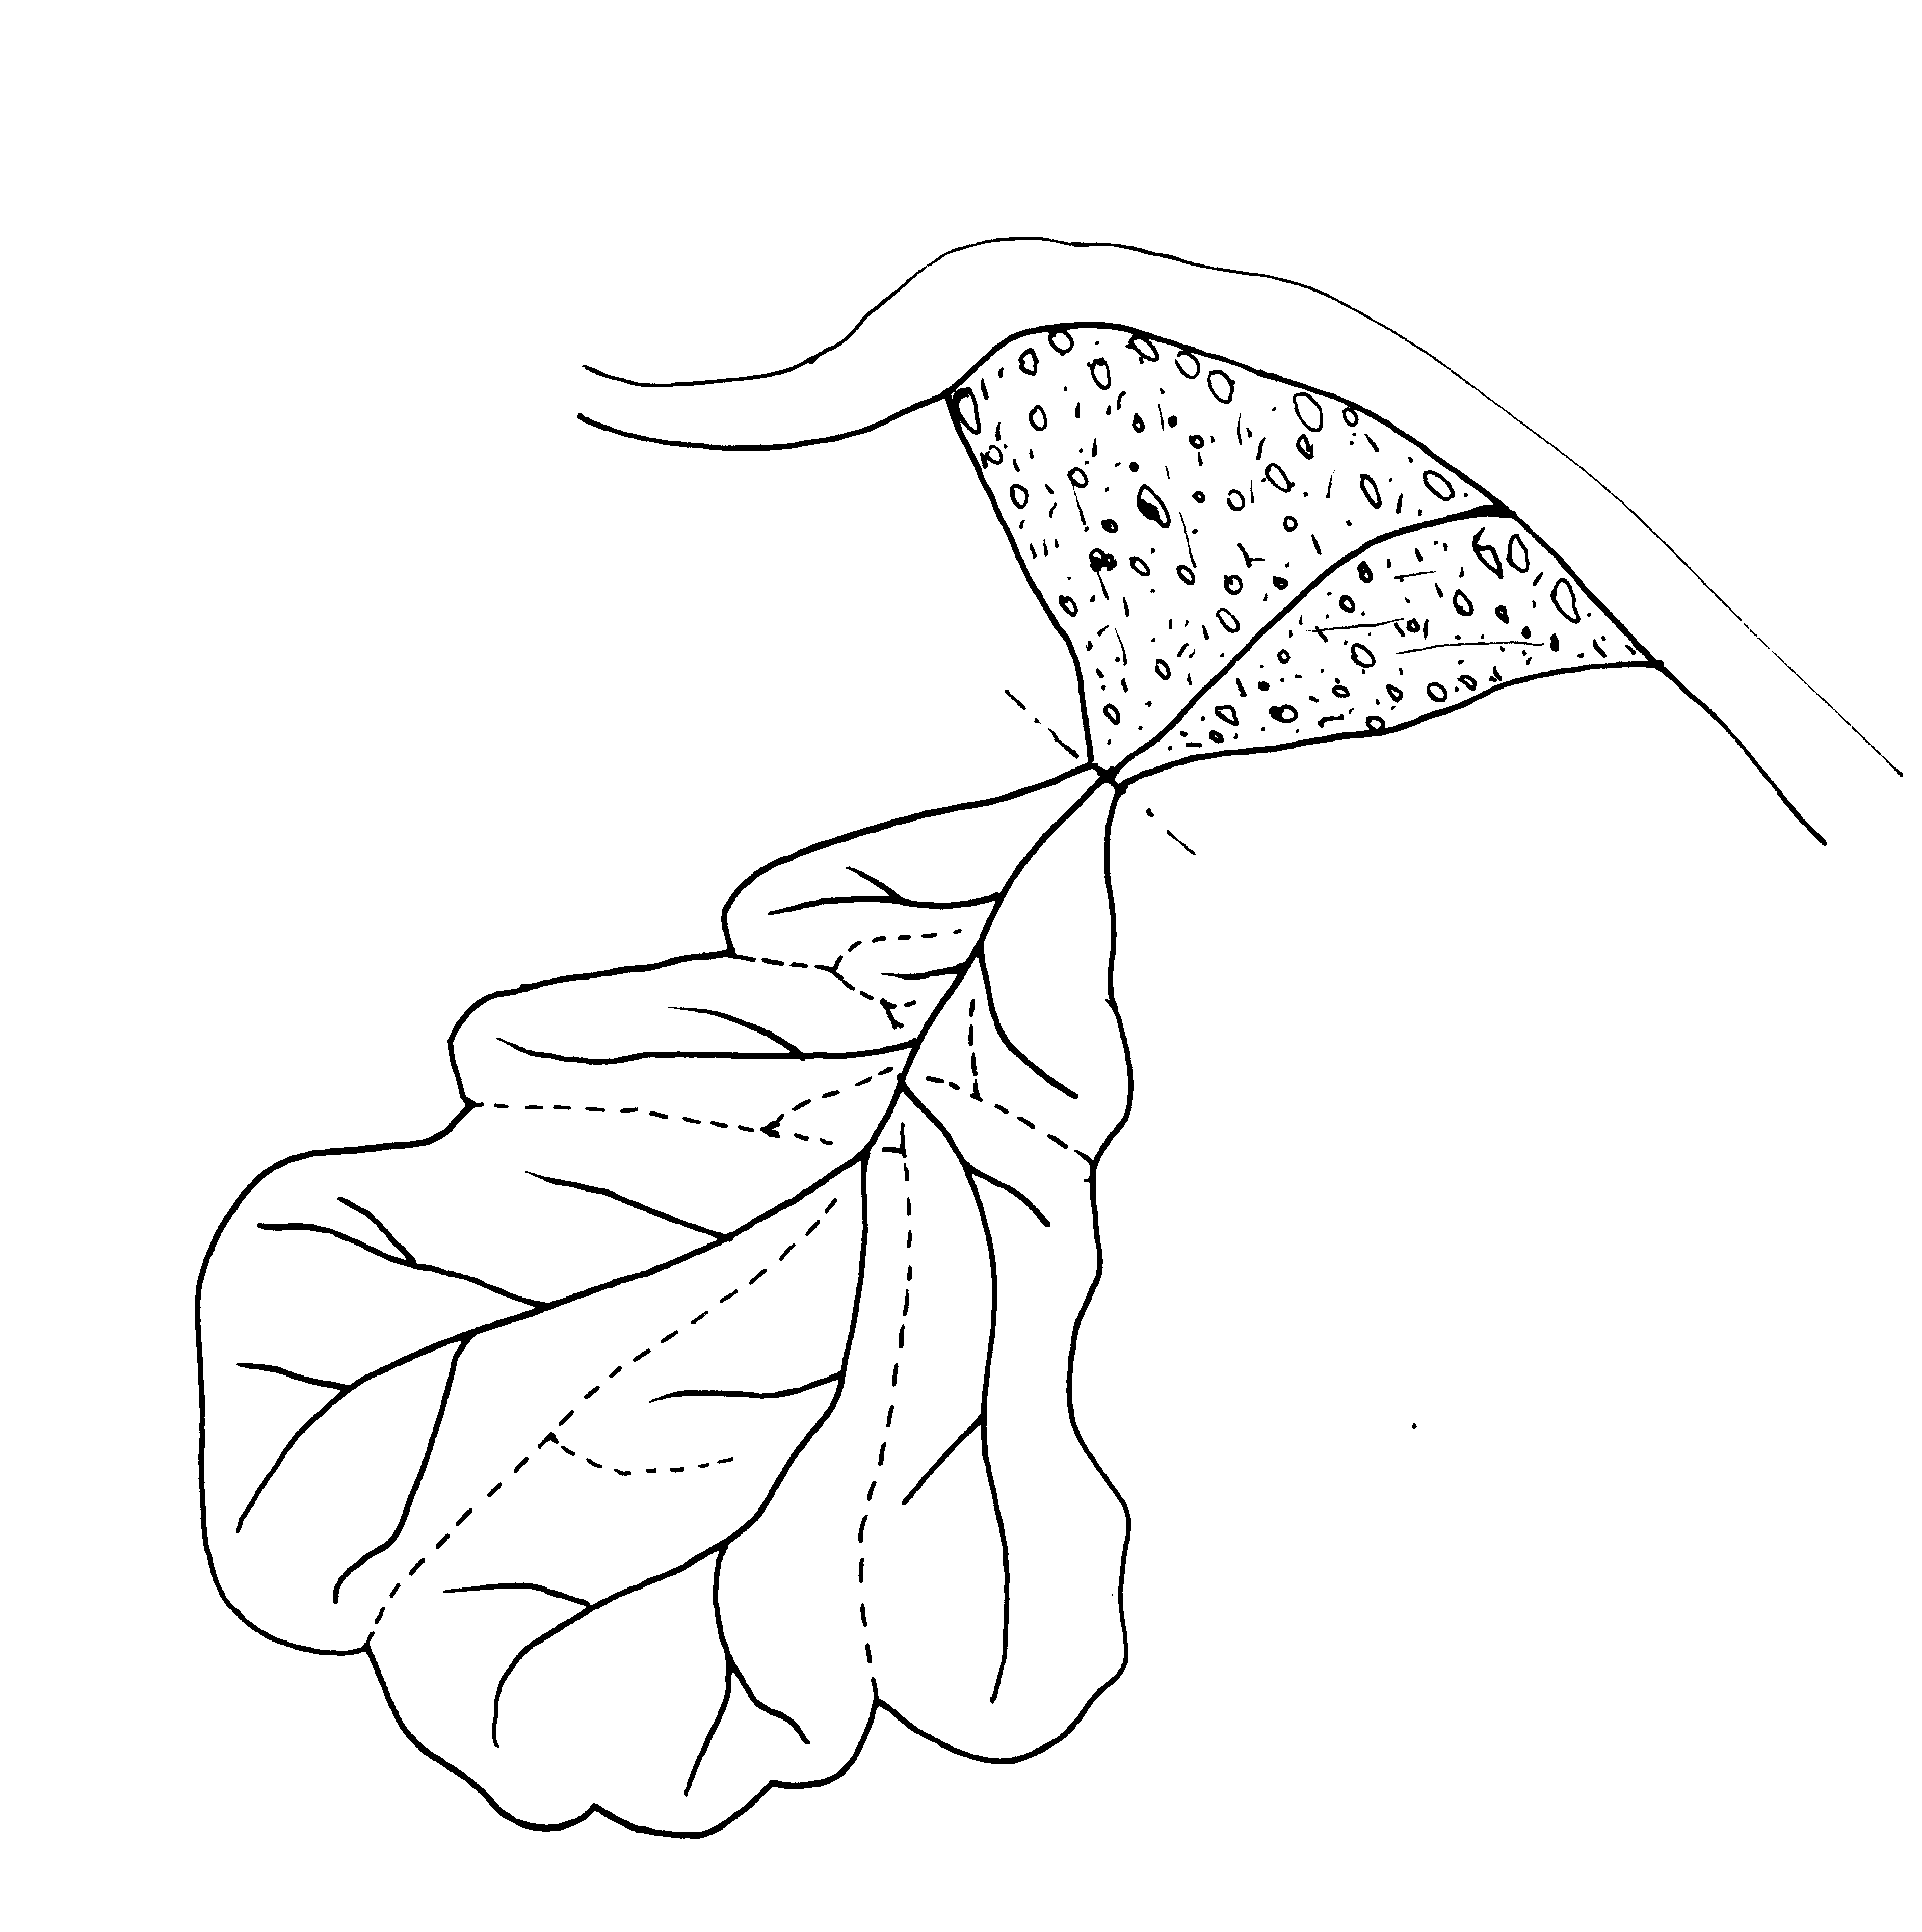 Figura 3. Schema bacino idrografico